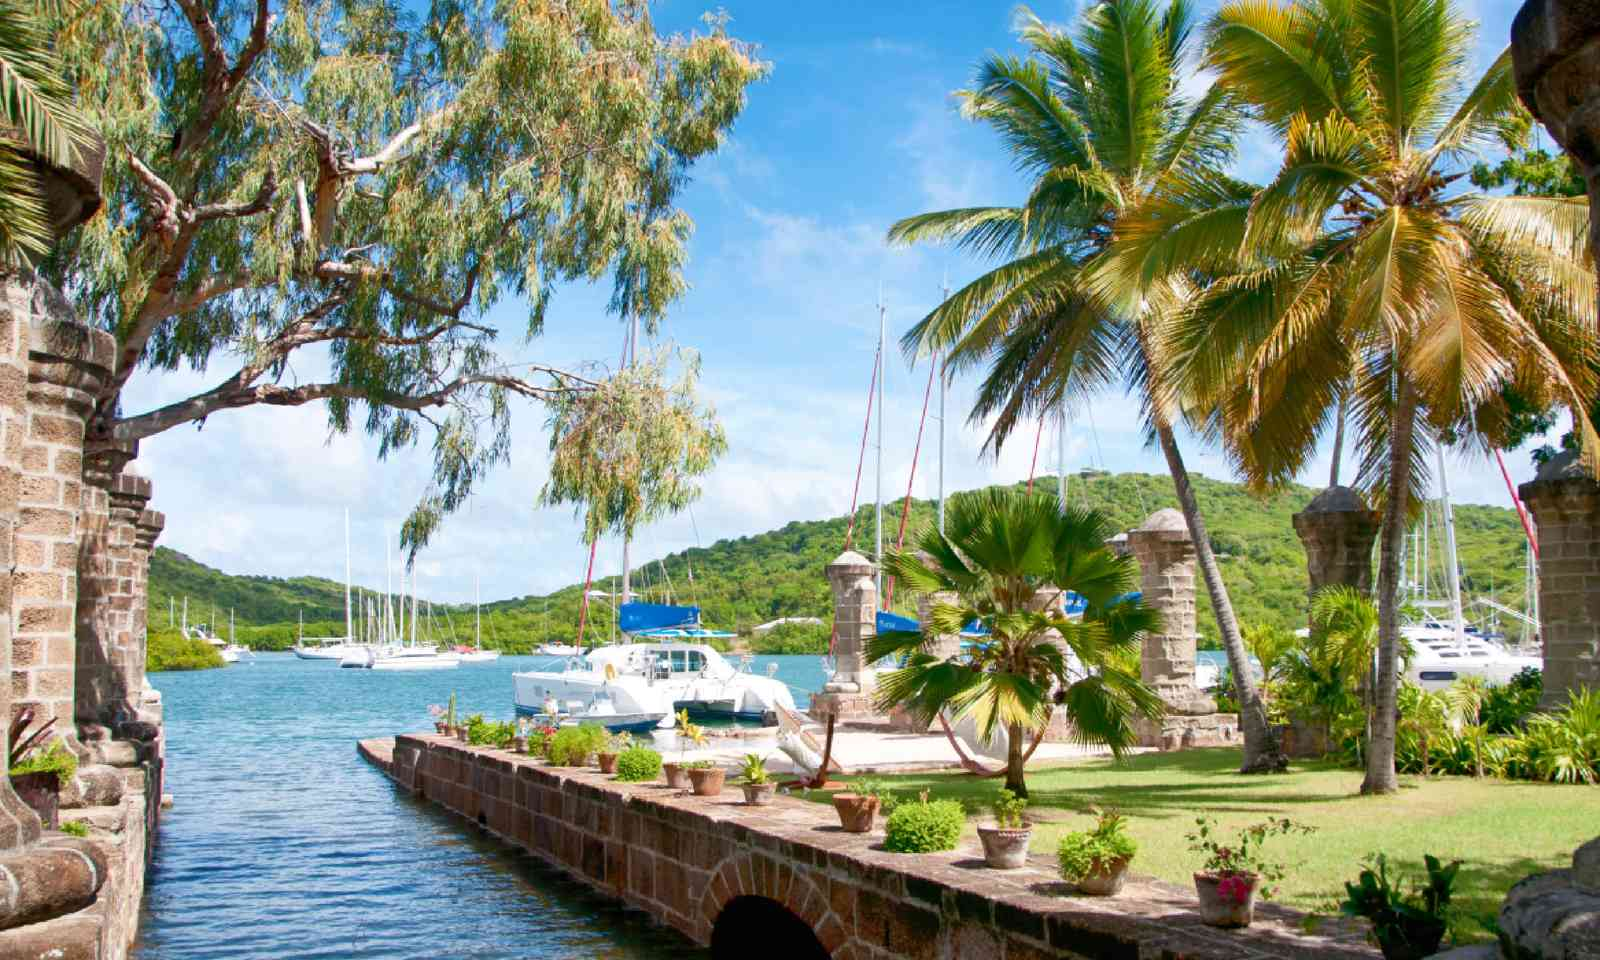 Nelson's Dockyard (Shutterstock)